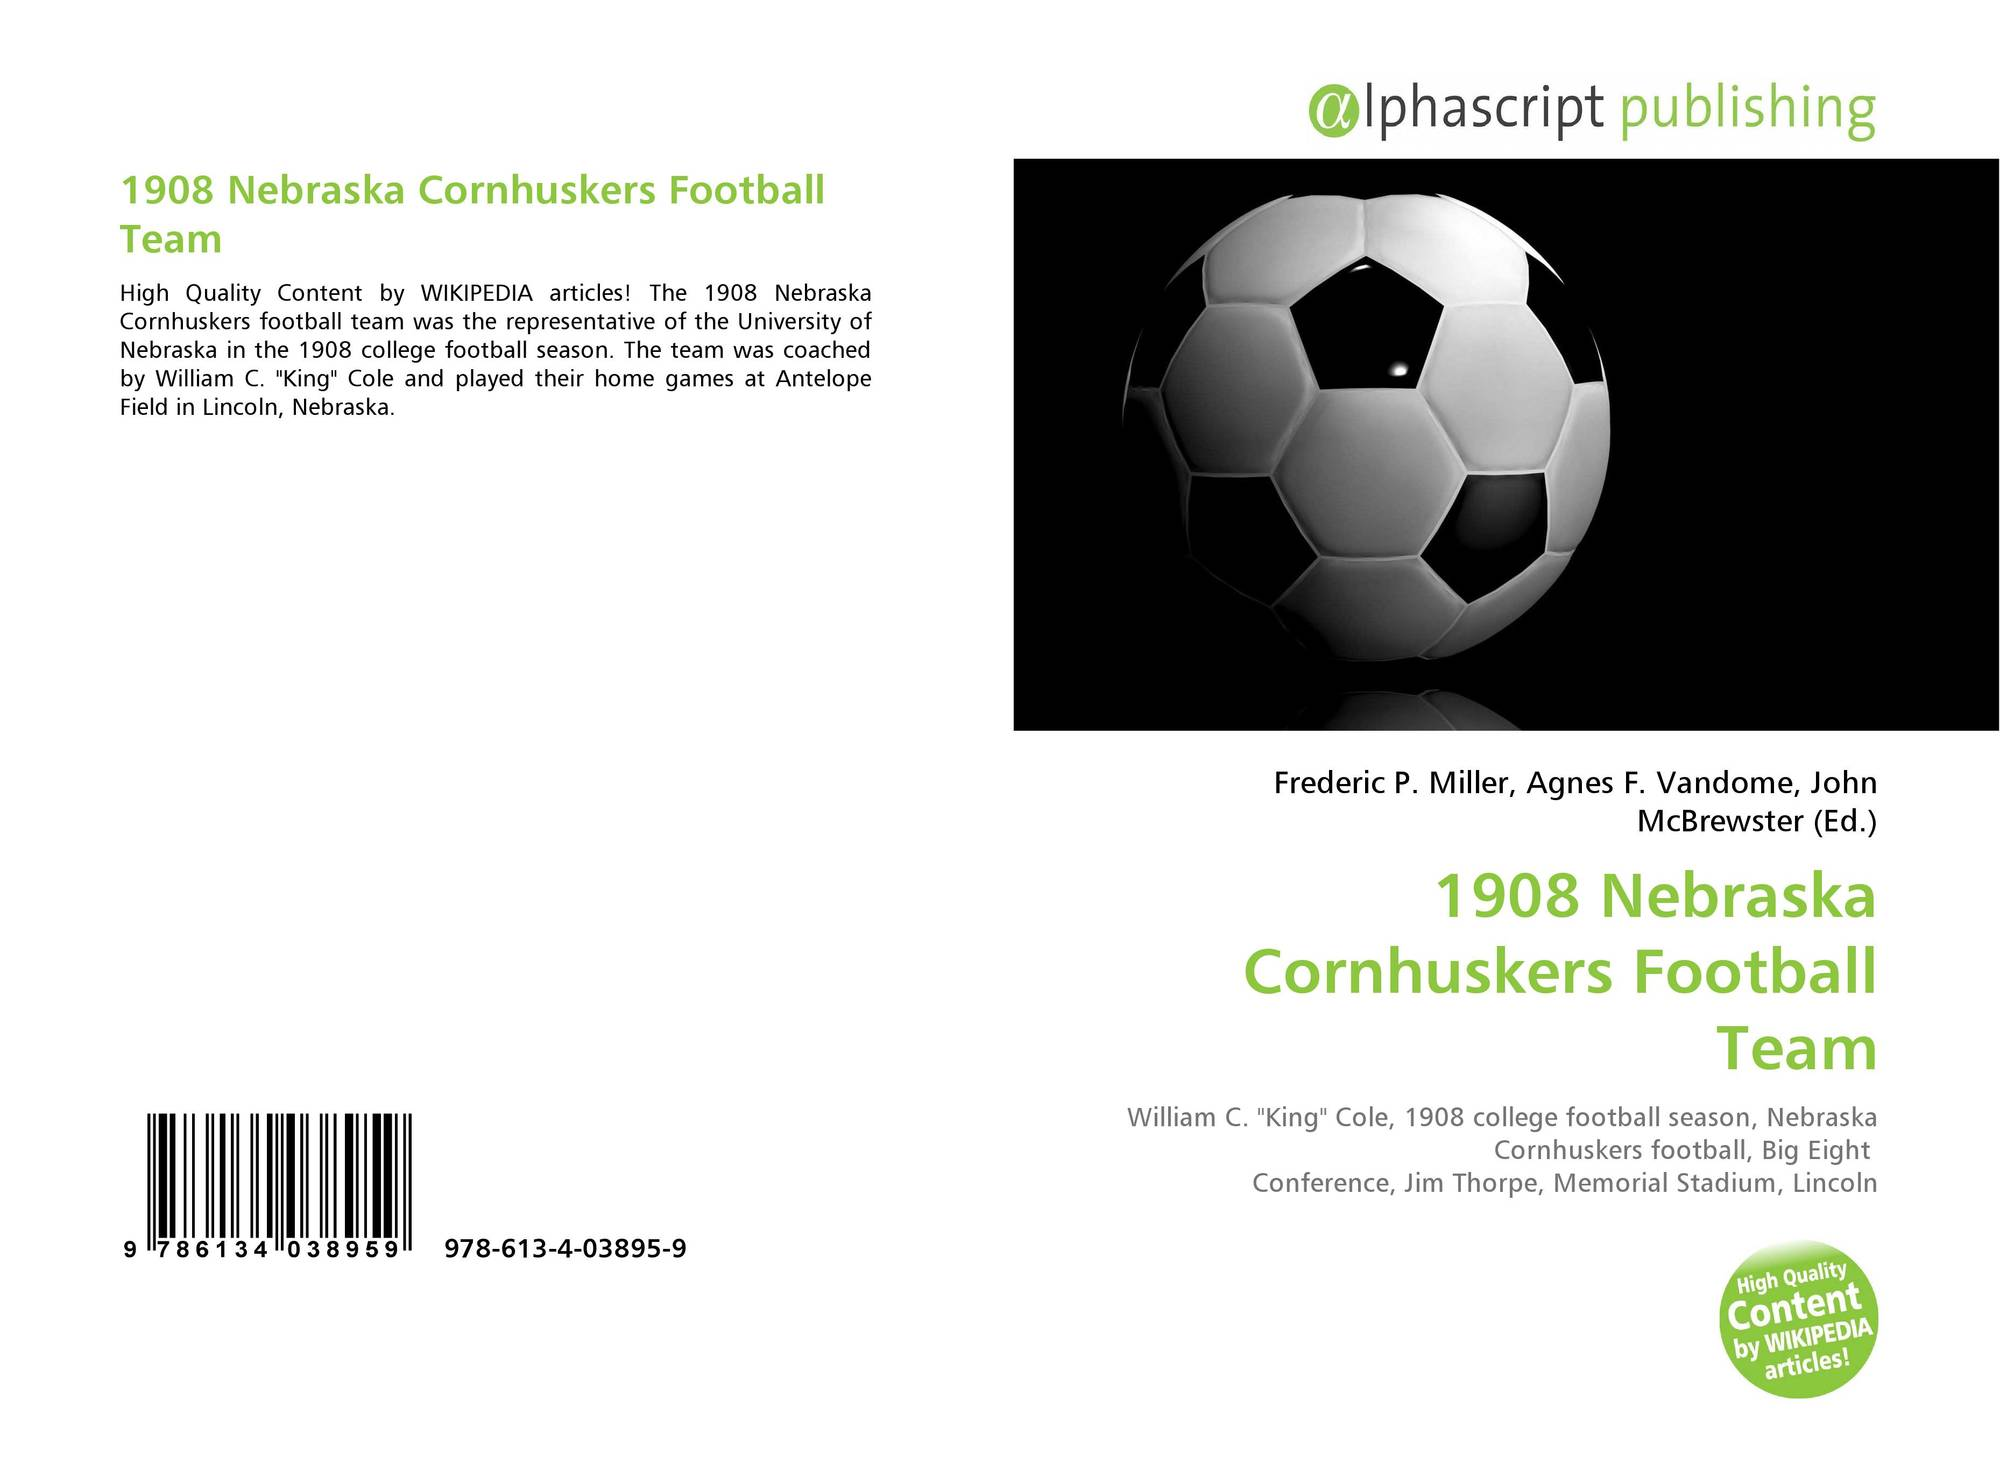 1b524edb1 Bookcover of 1908 Nebraska Cornhuskers Football Team. Omni badge  9307e2201e5f762643a64561af3456be64a87707602f96b92ef18a9bbcada116